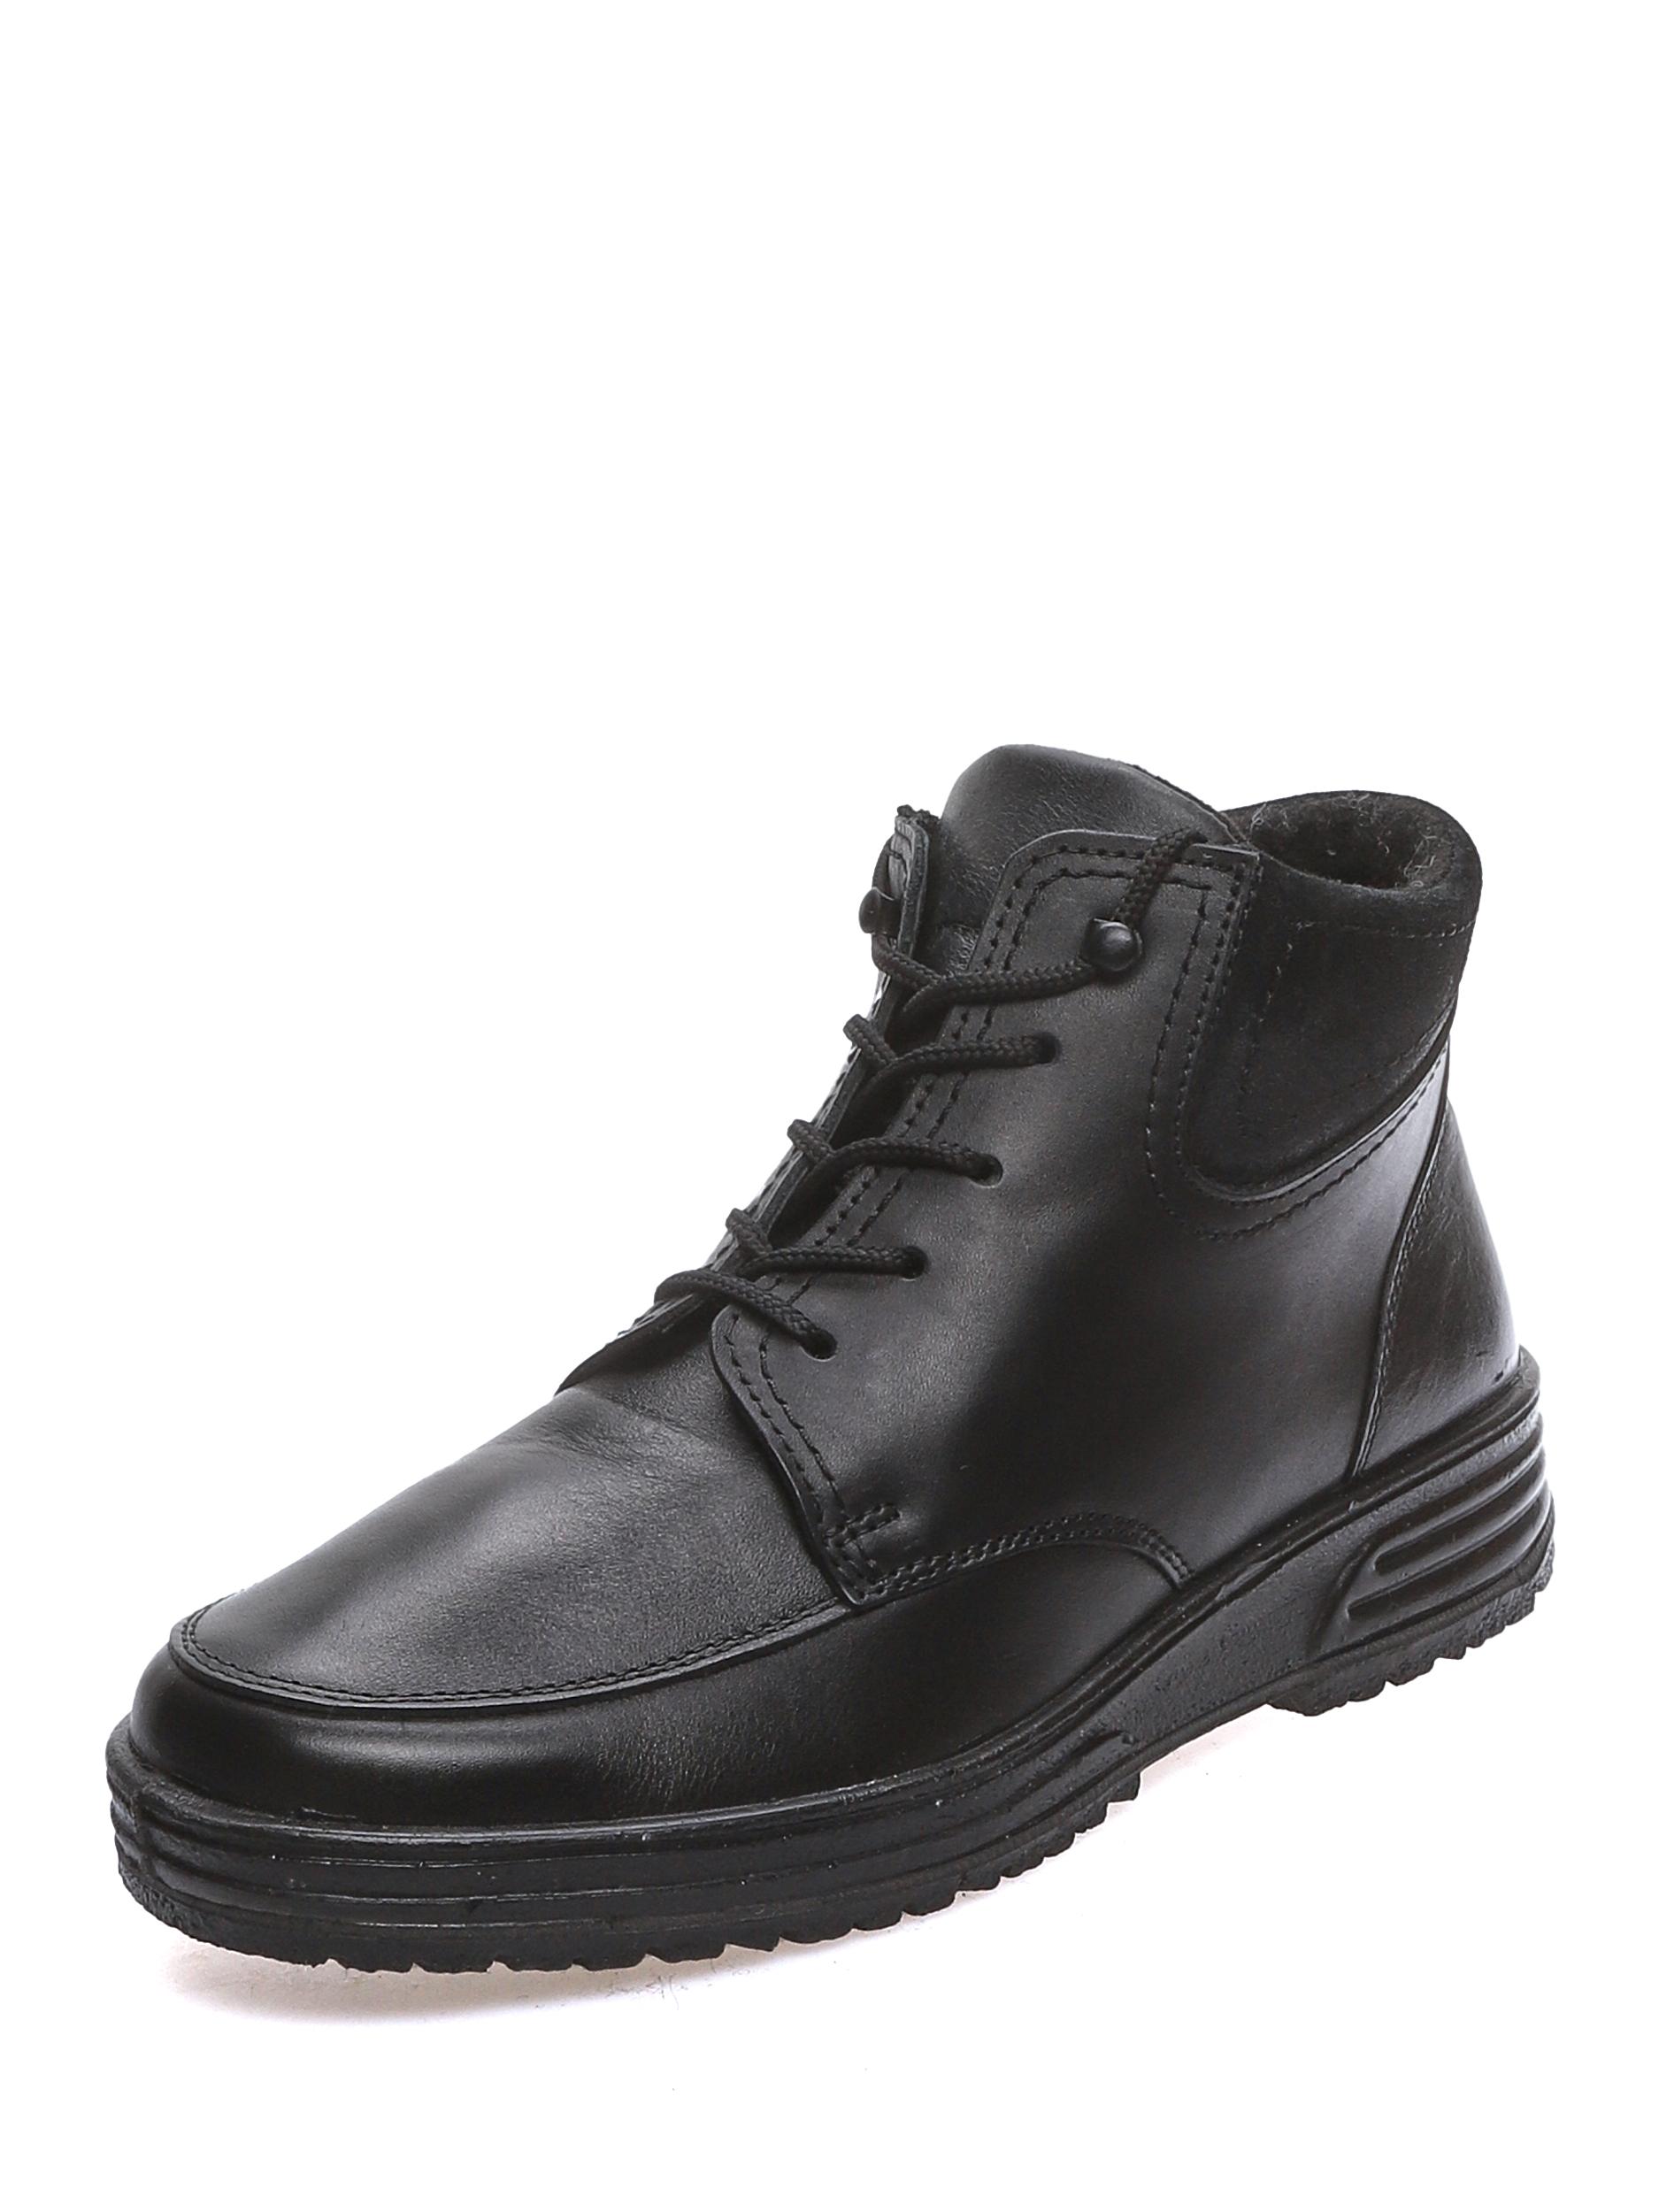 Ботинки женские MAKFLY 88MF-36-01 черные 40 RU